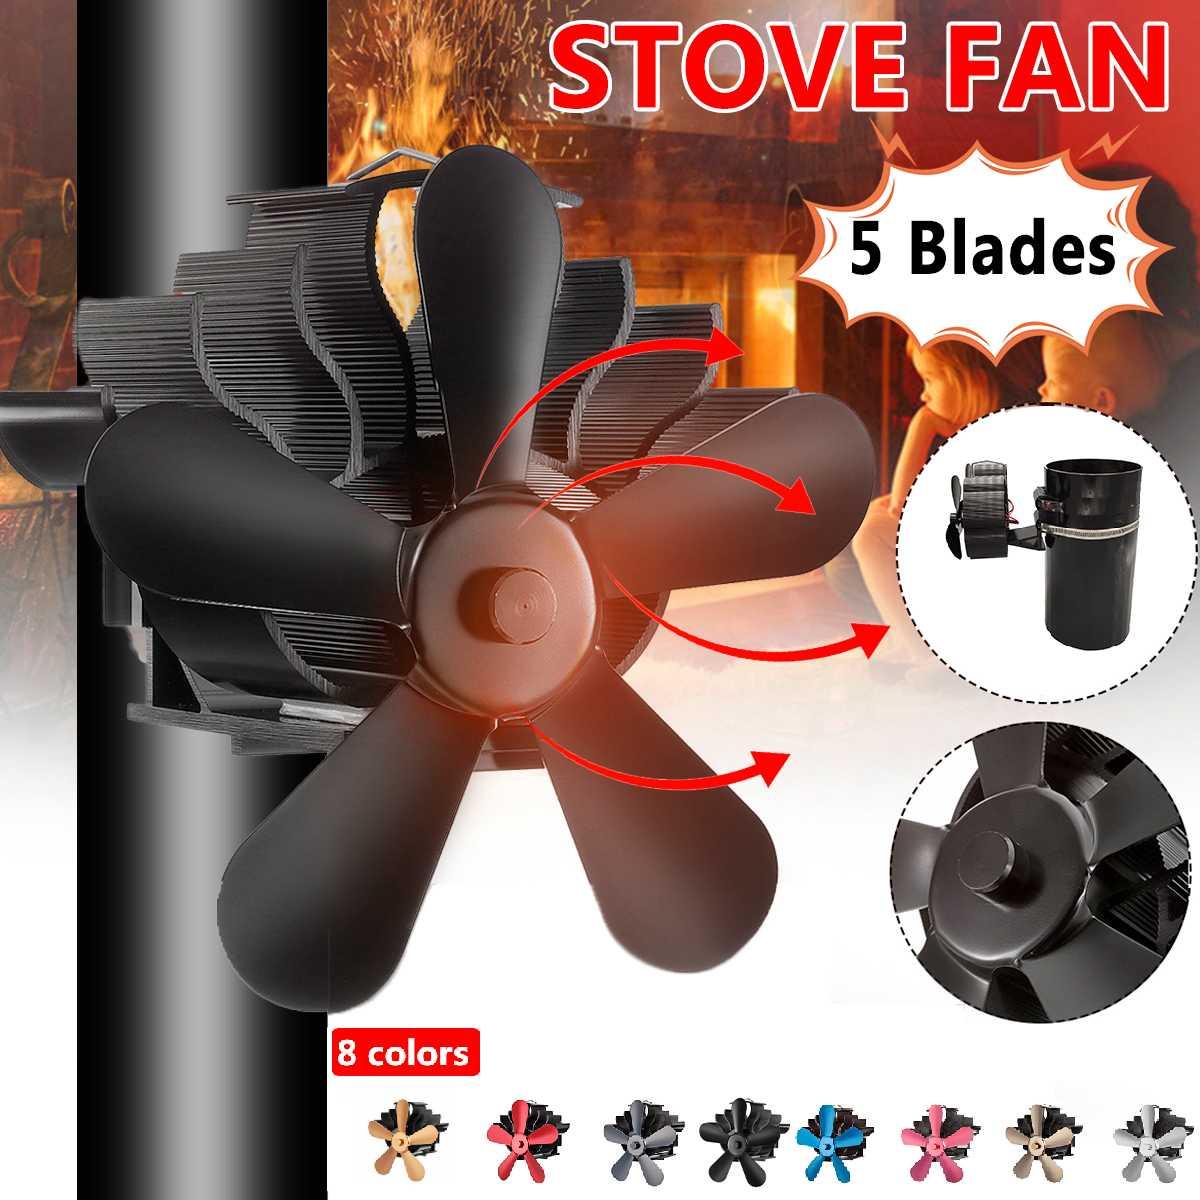 Mouted Type Black 5 Blade Heat Powered Stove Fan Komin Log Wood Burner Eco Friendly Quiet Fan Home Efficient Heat Distribution